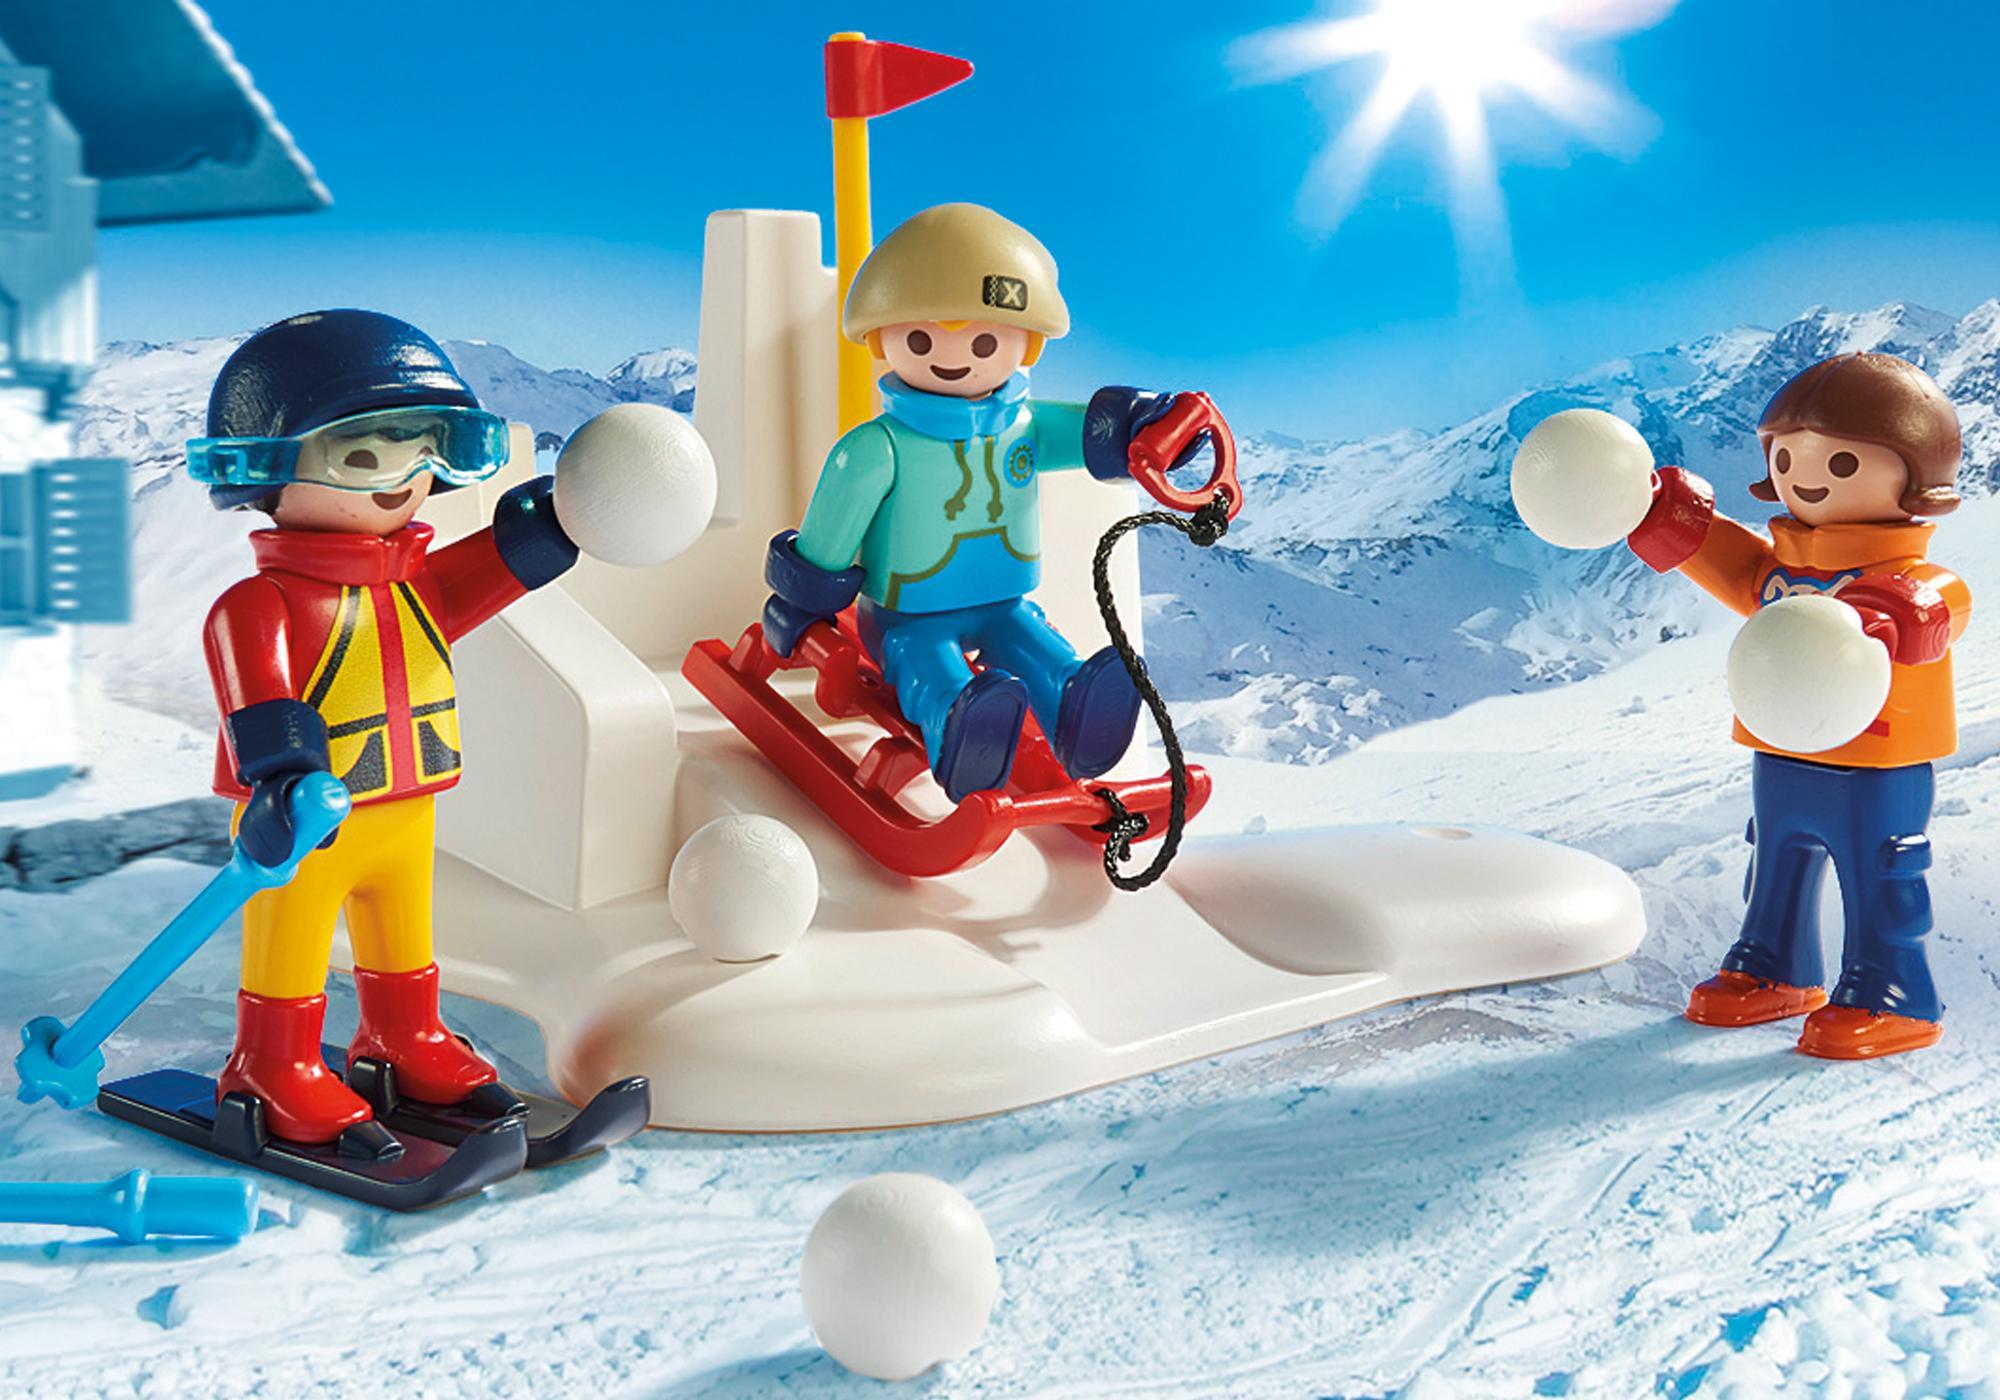 http://media.playmobil.com/i/playmobil/9283_product_extra1/Enfants avec boules de neige